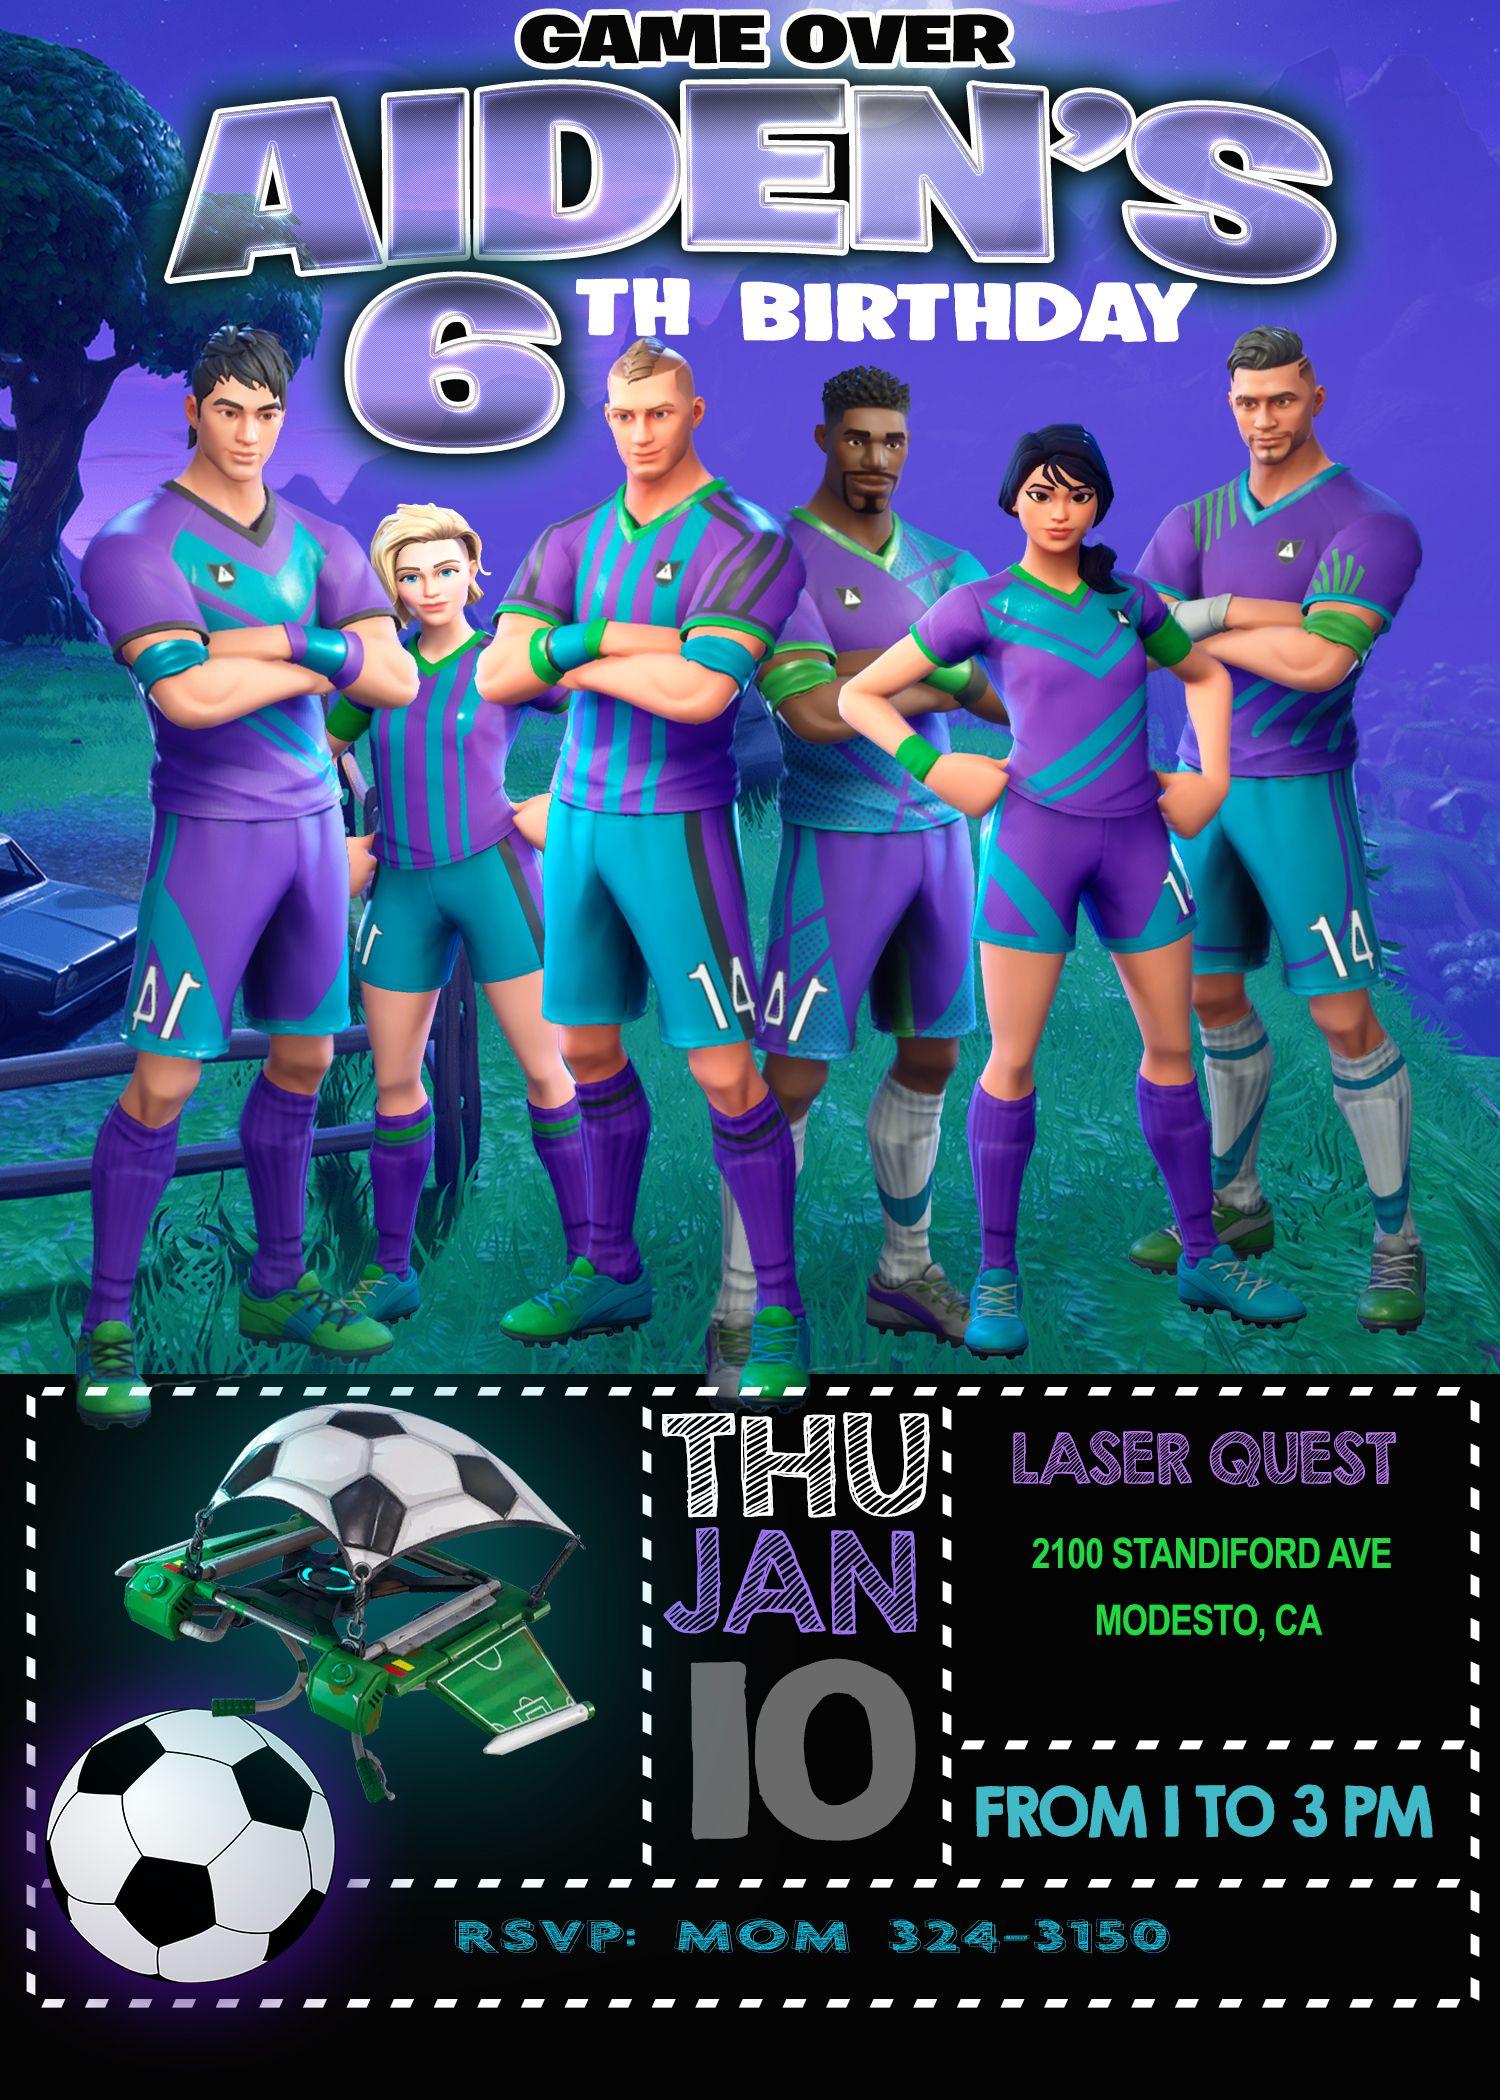 Fortnite Soccer Skins Birthday Invitation Oscarsitosroom Soccer Birthday Parties Birthday Invitations Birthday Party Invitations Printable